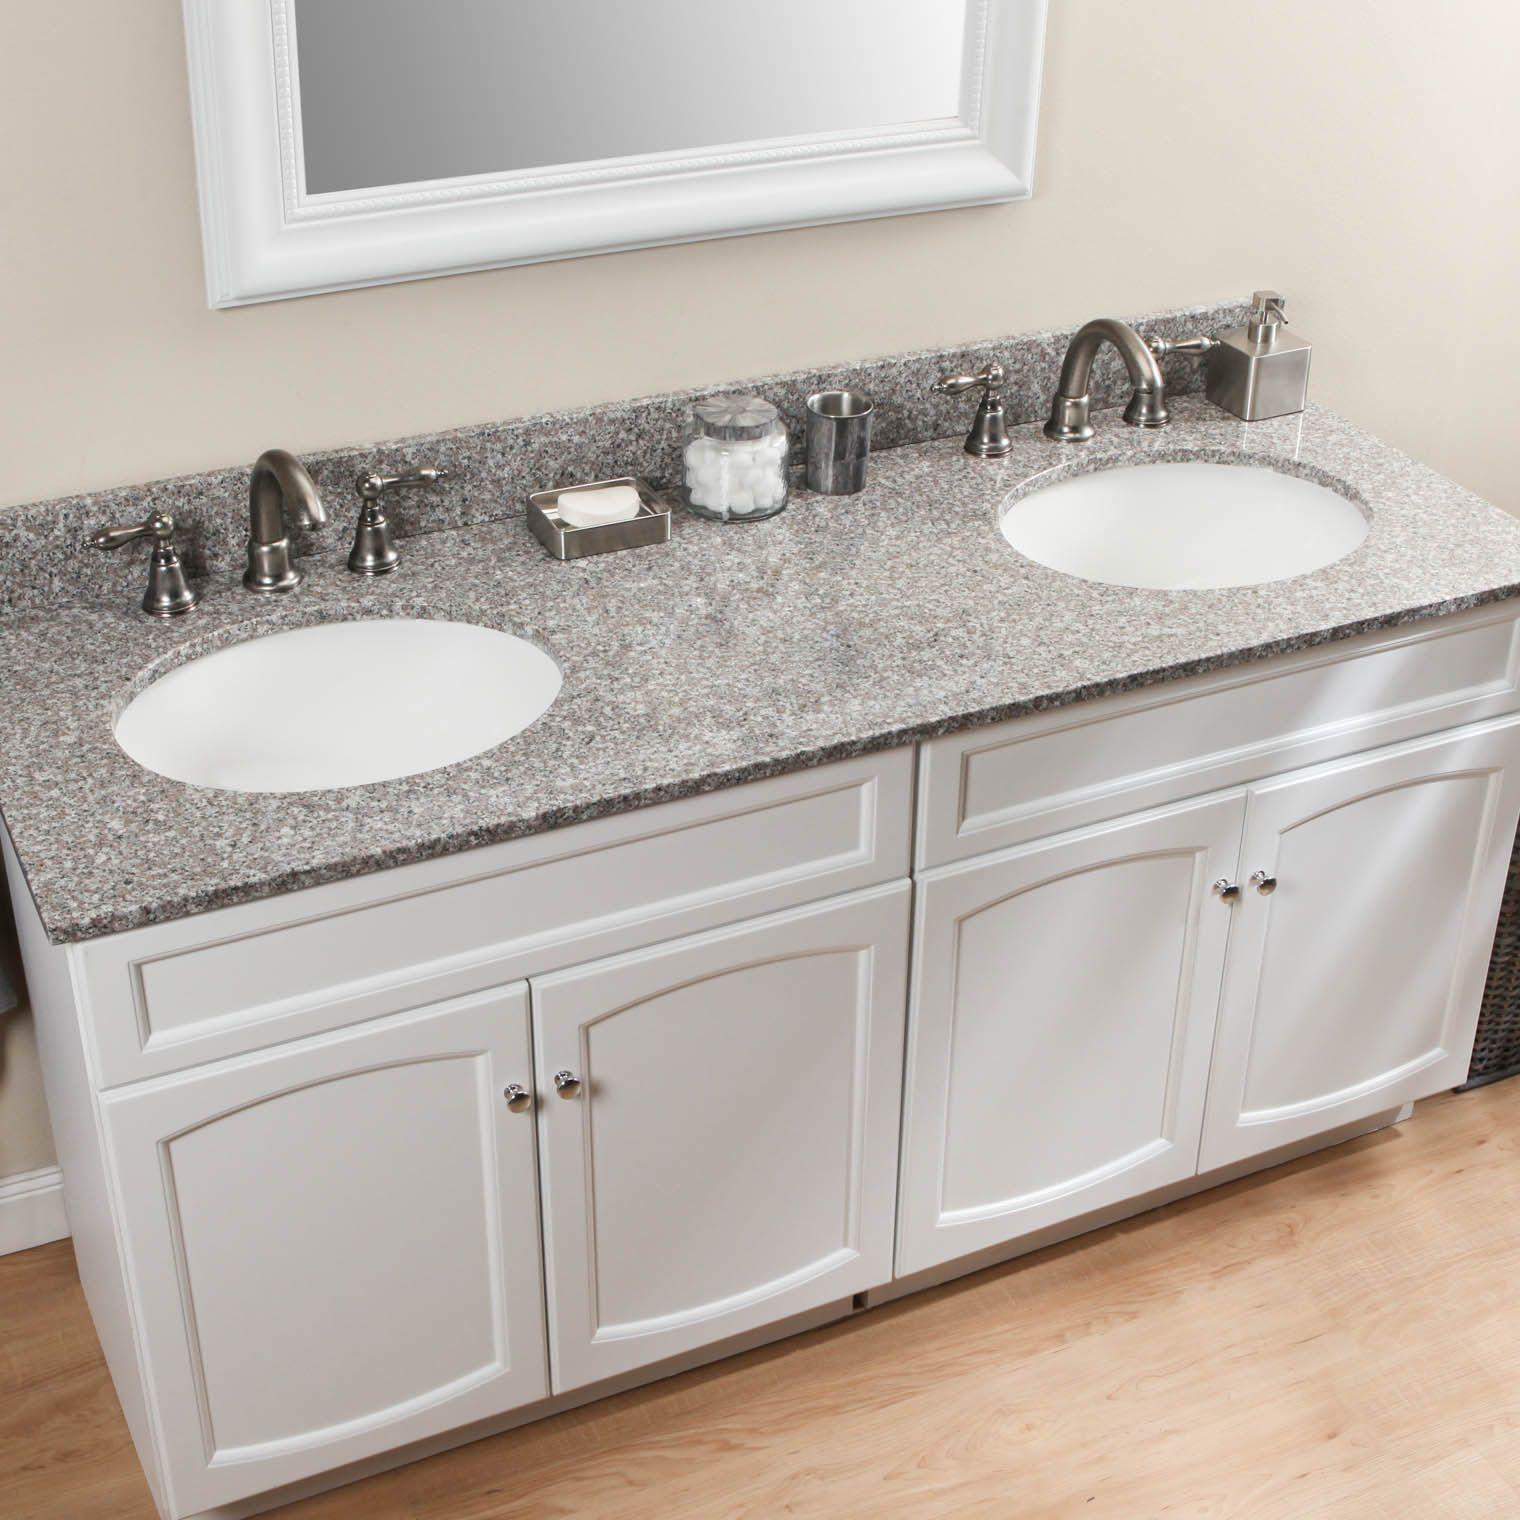 burlywood granite in bathrooms | Kitchen Design | Pinterest